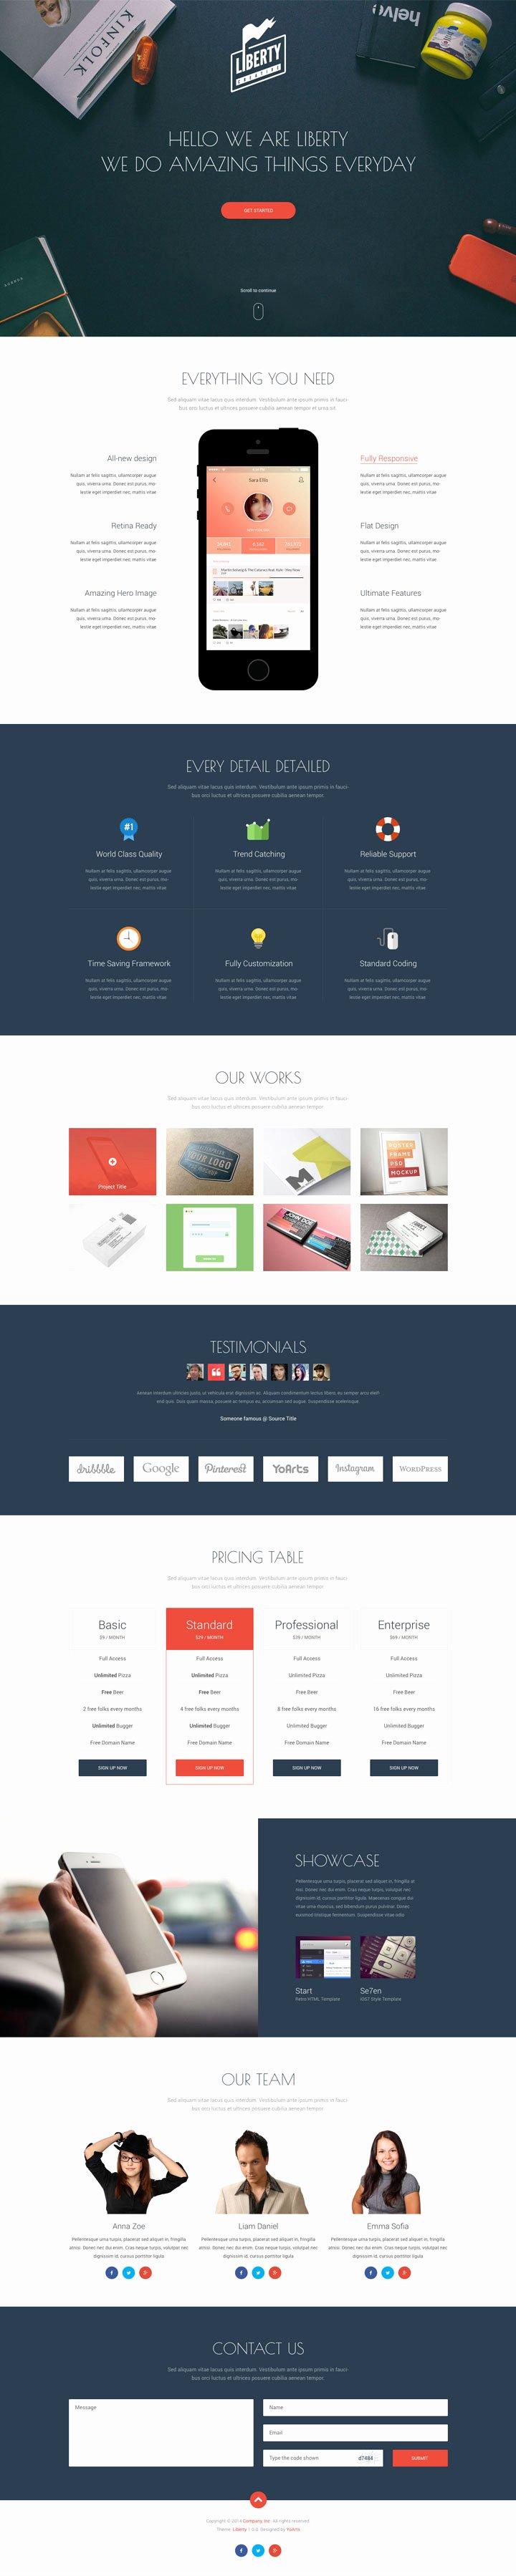 E Page Responsive HTML5 Web Template – Creative Alys